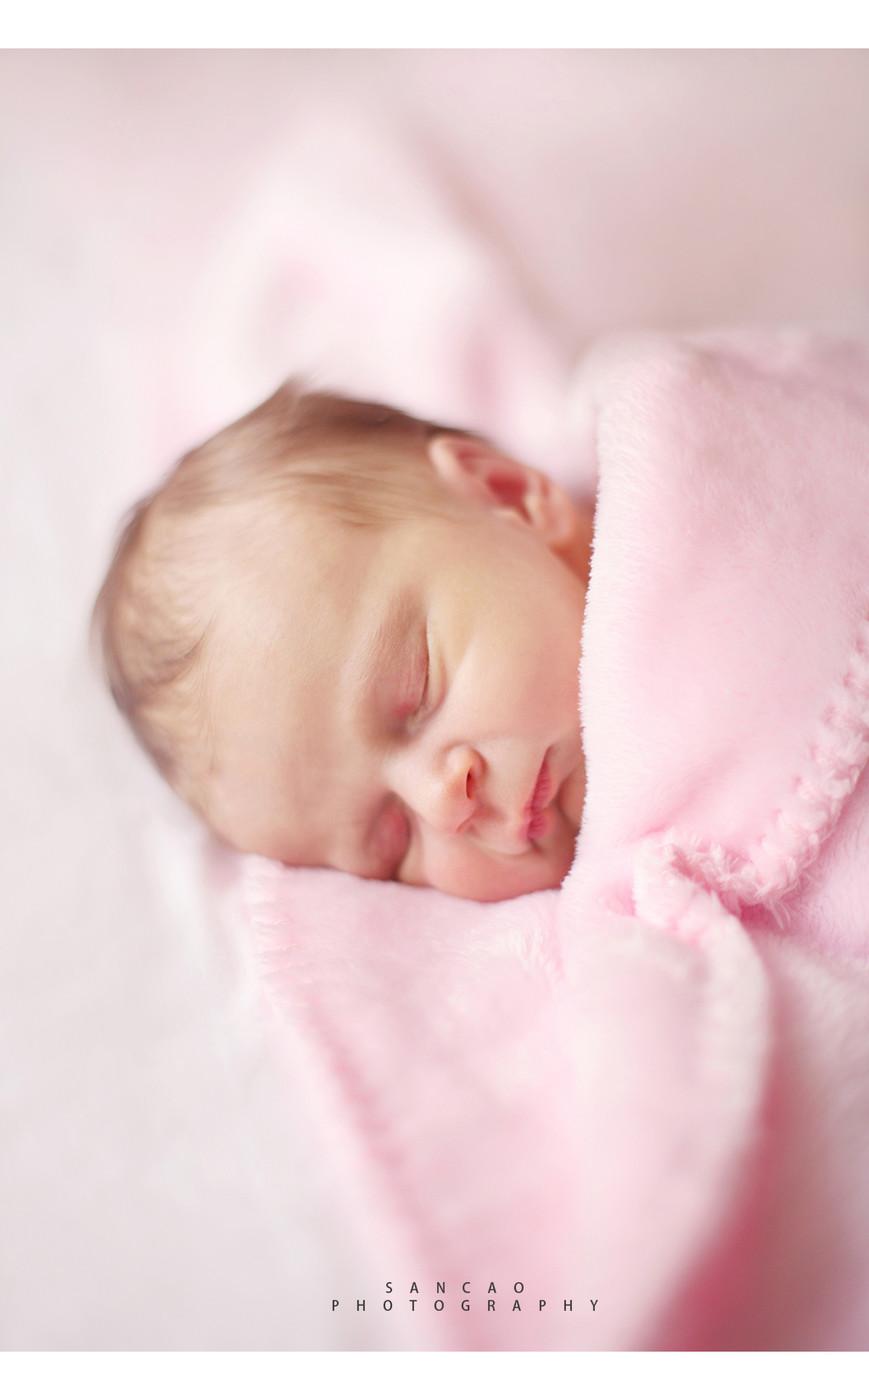 婴儿(0-6个月)8